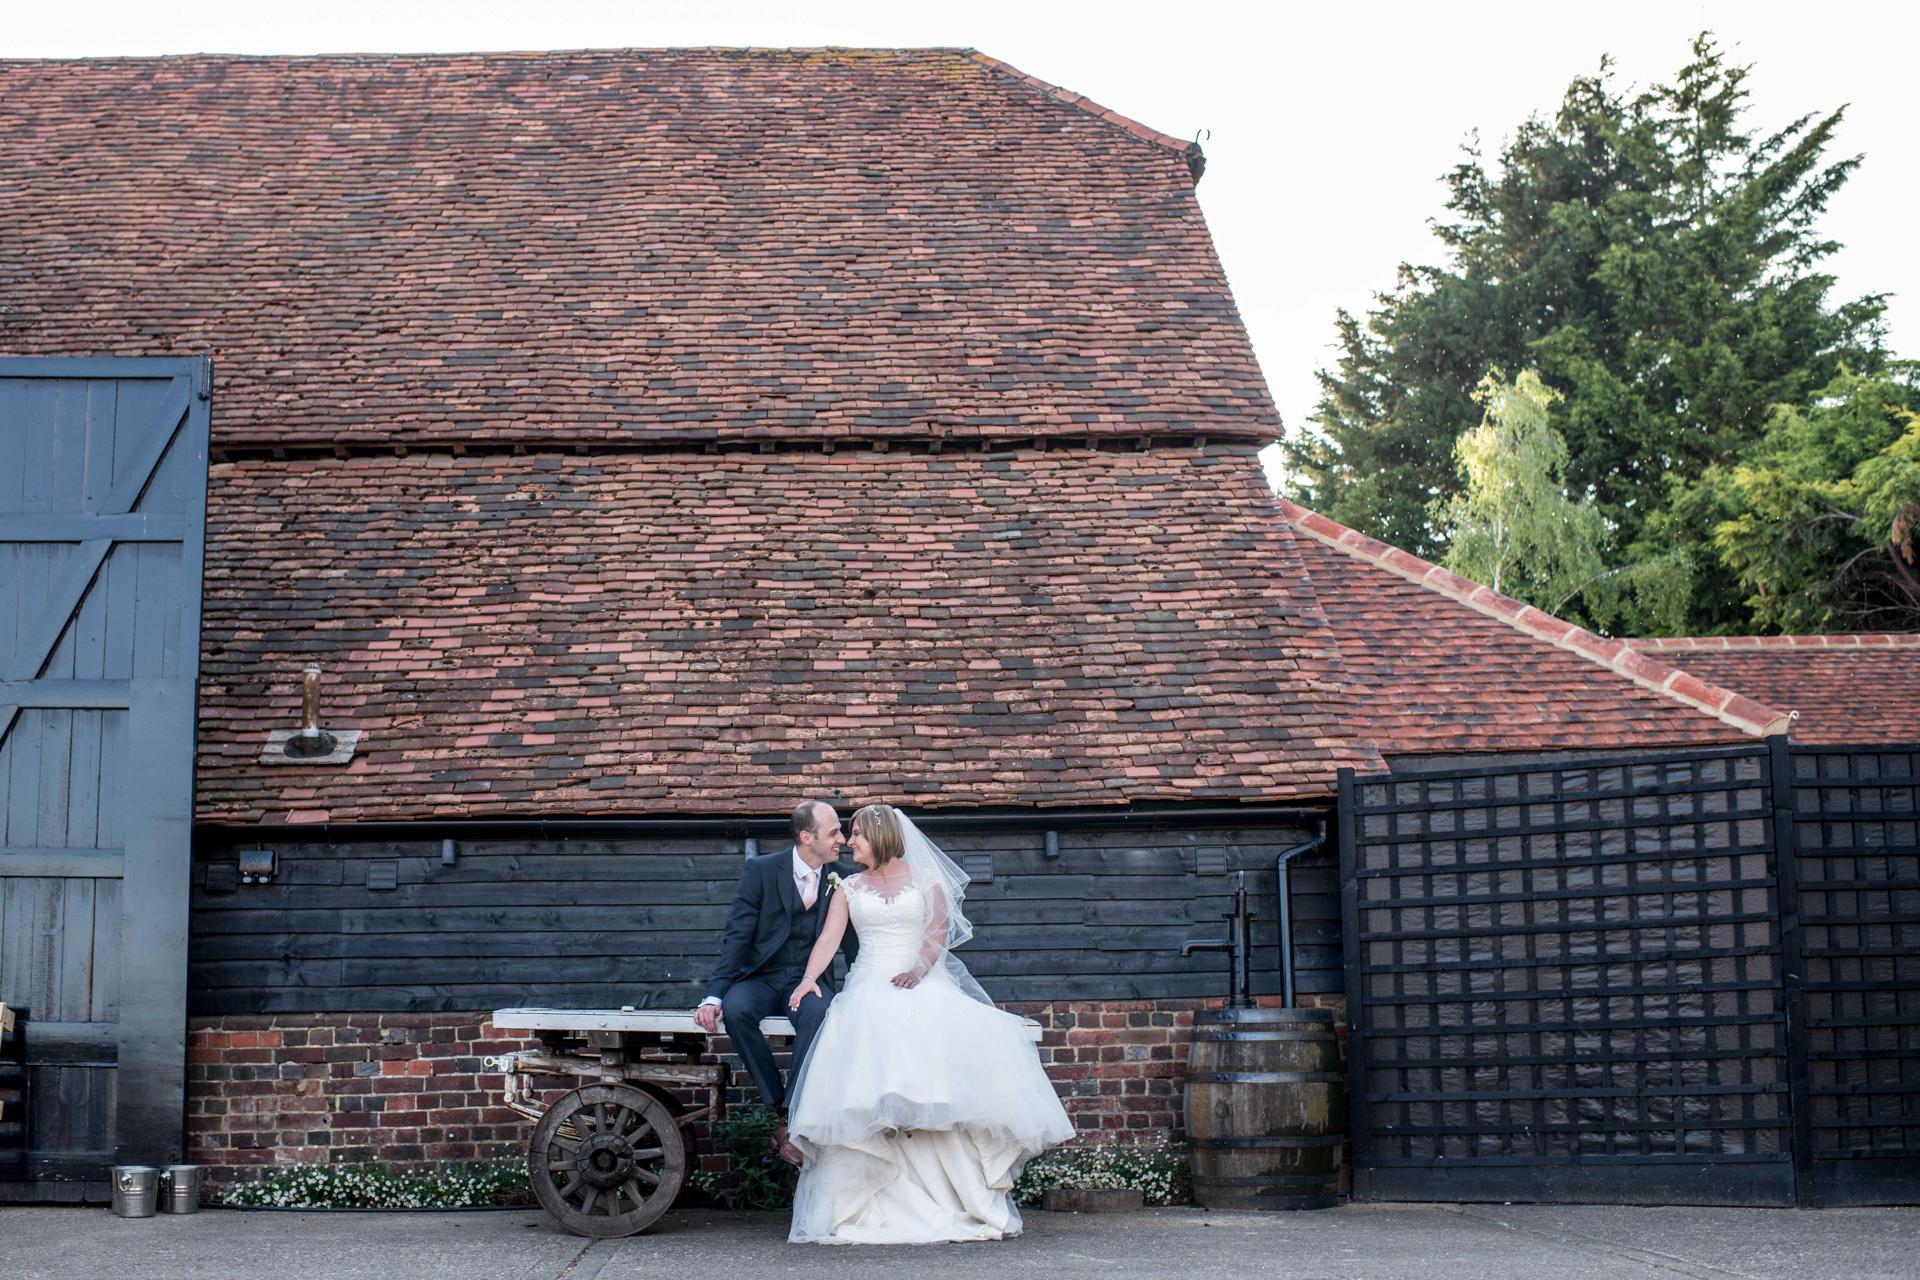 Lillibrook Manor Barn Wedding, Maidenhead, Alexandria Hall Photography (53 of 82).jpg